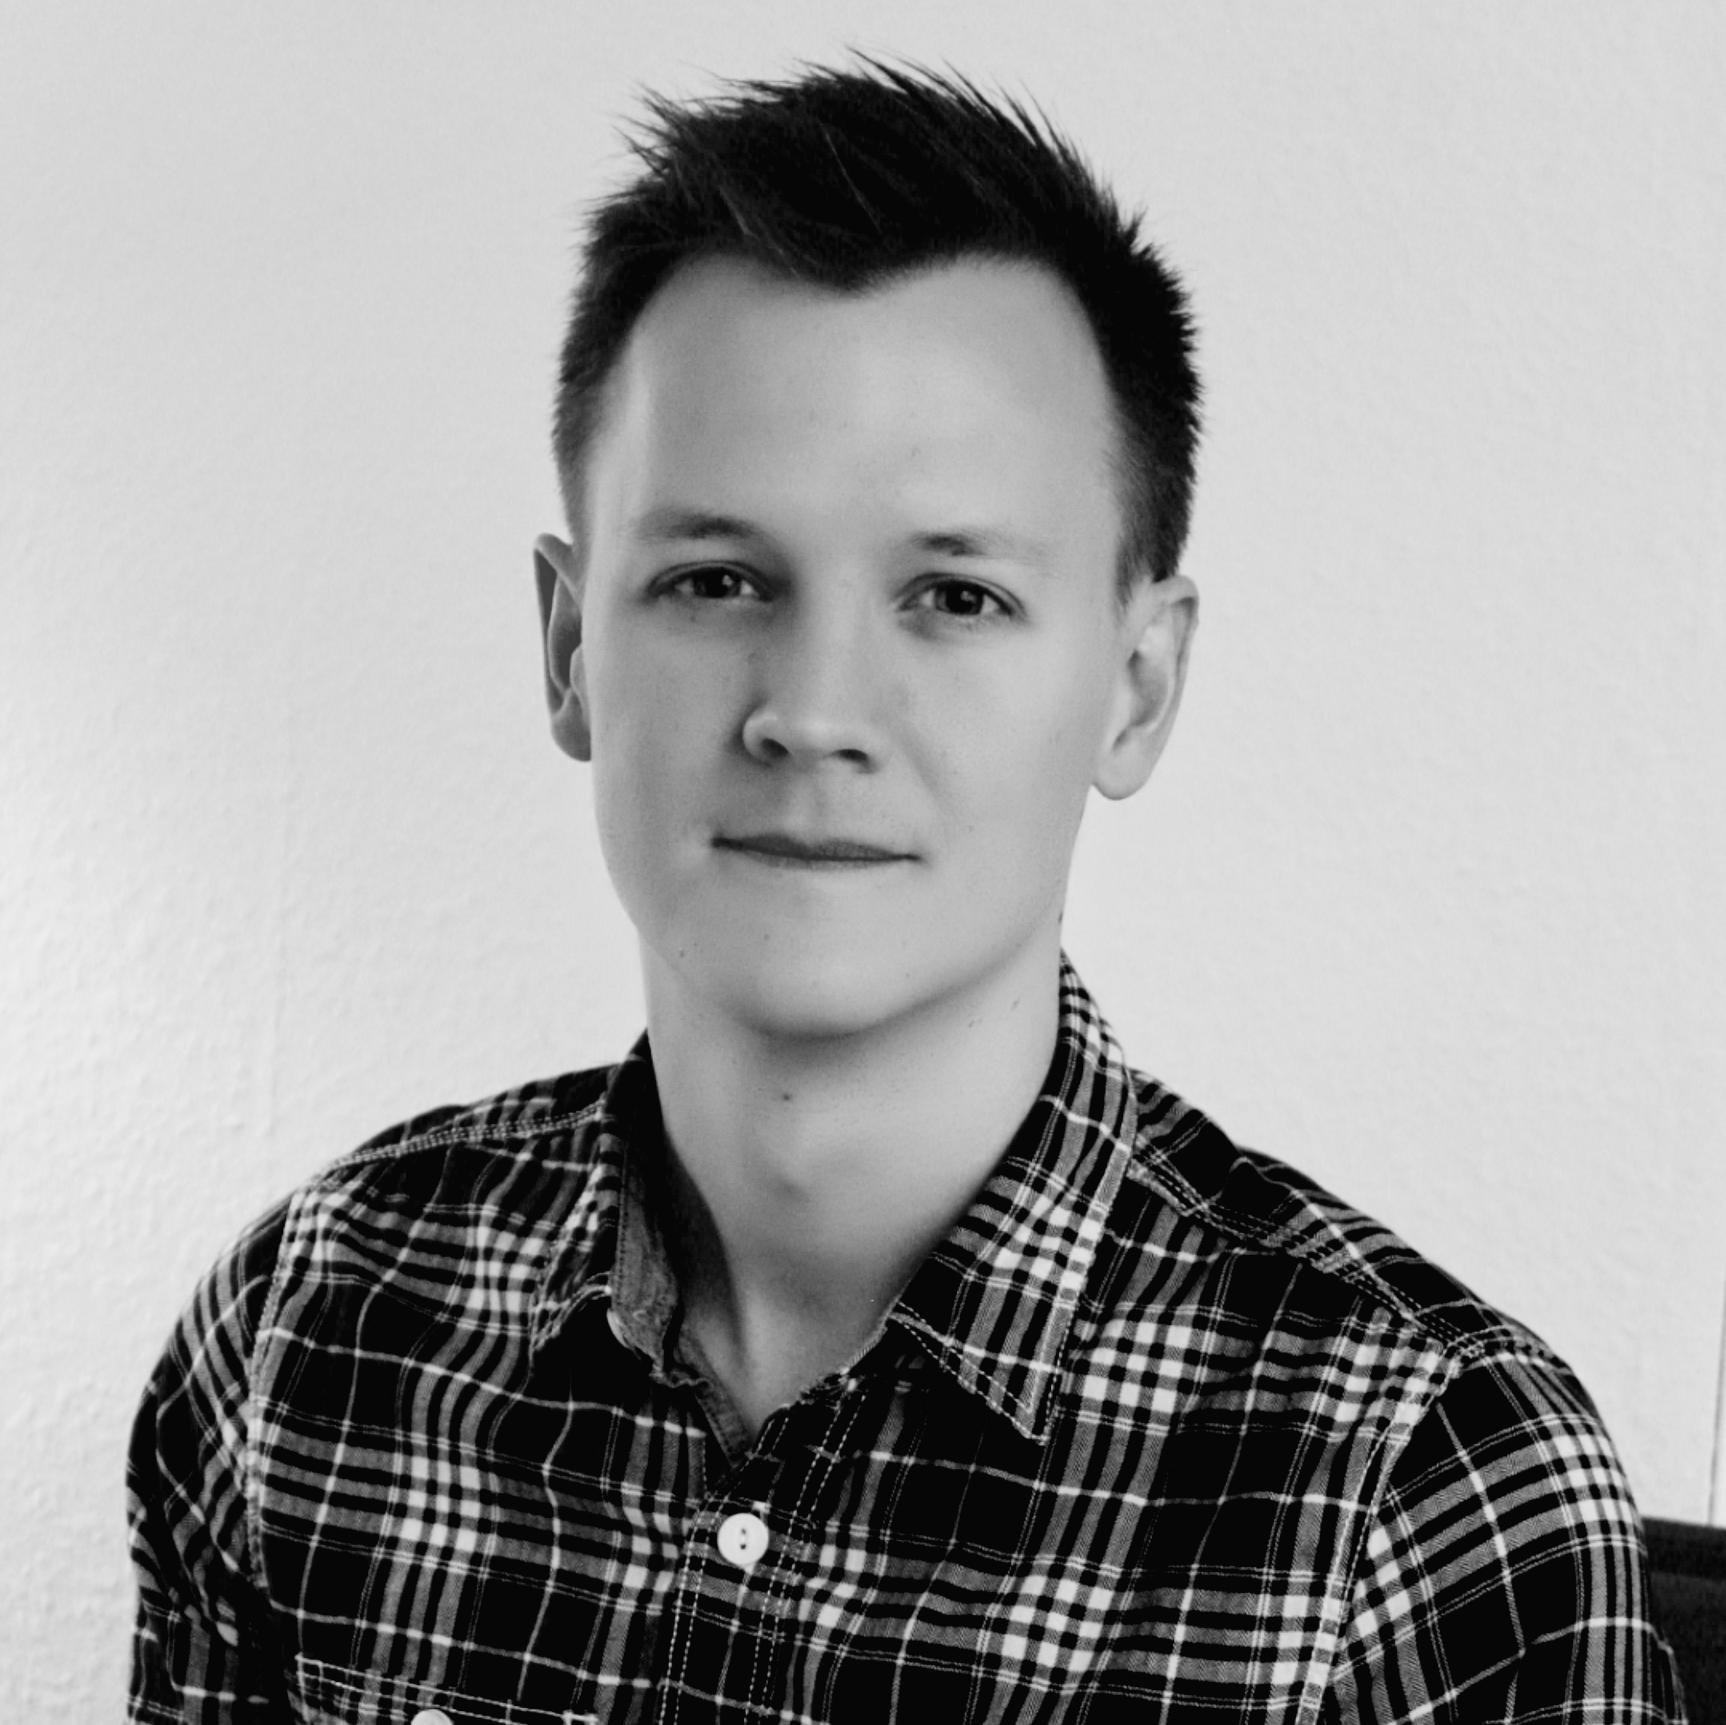 Christoffer Augsburg